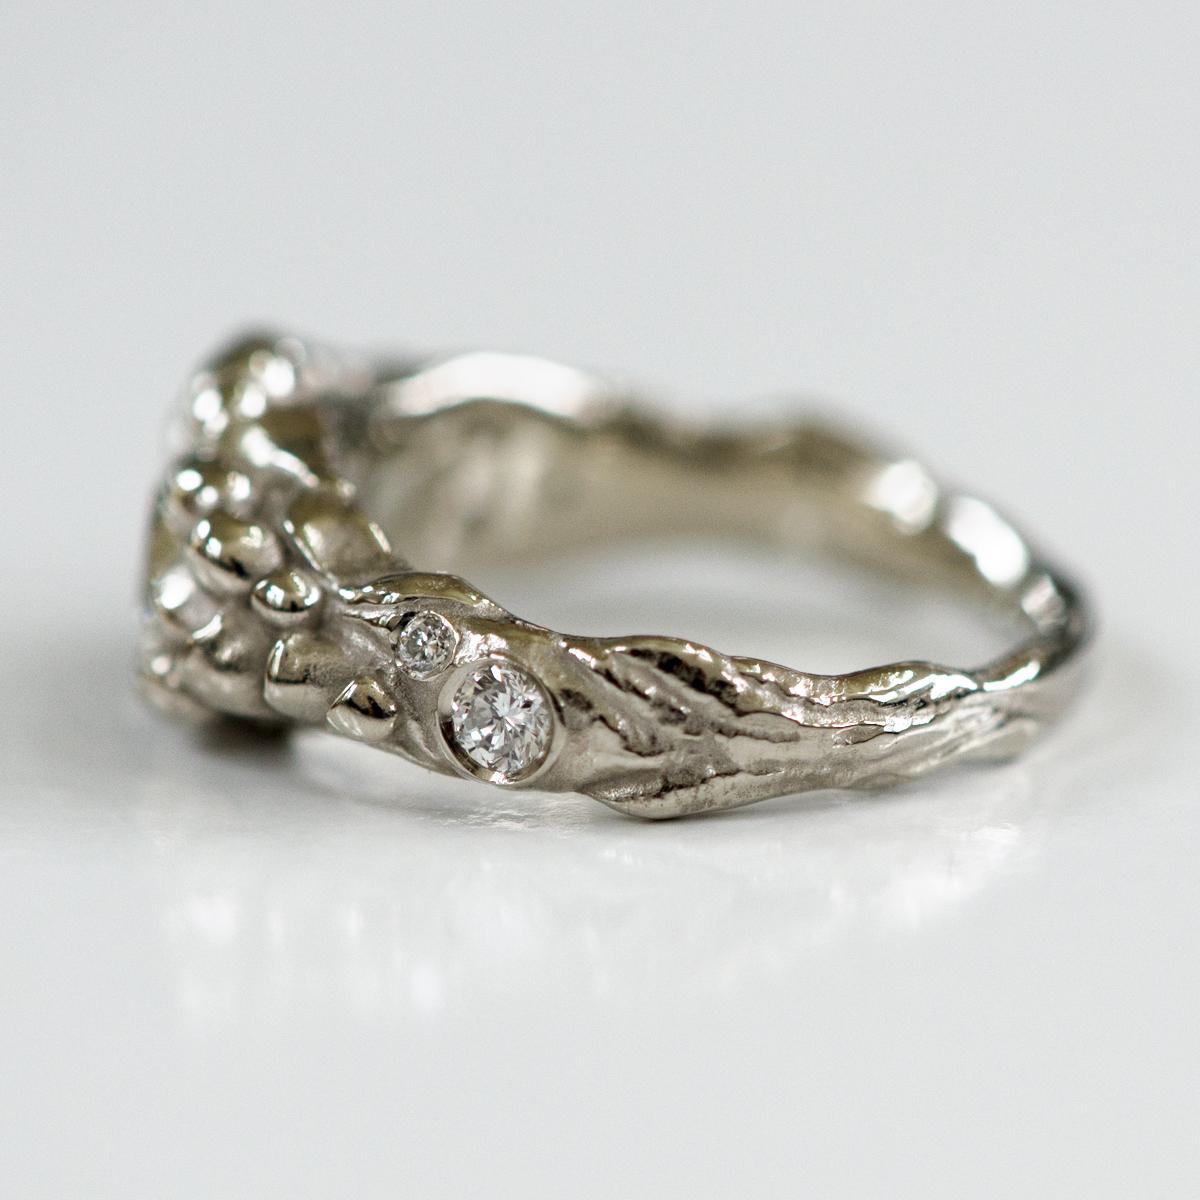 CG-Grisez-engagement ring-nature-hike-diamond-organic